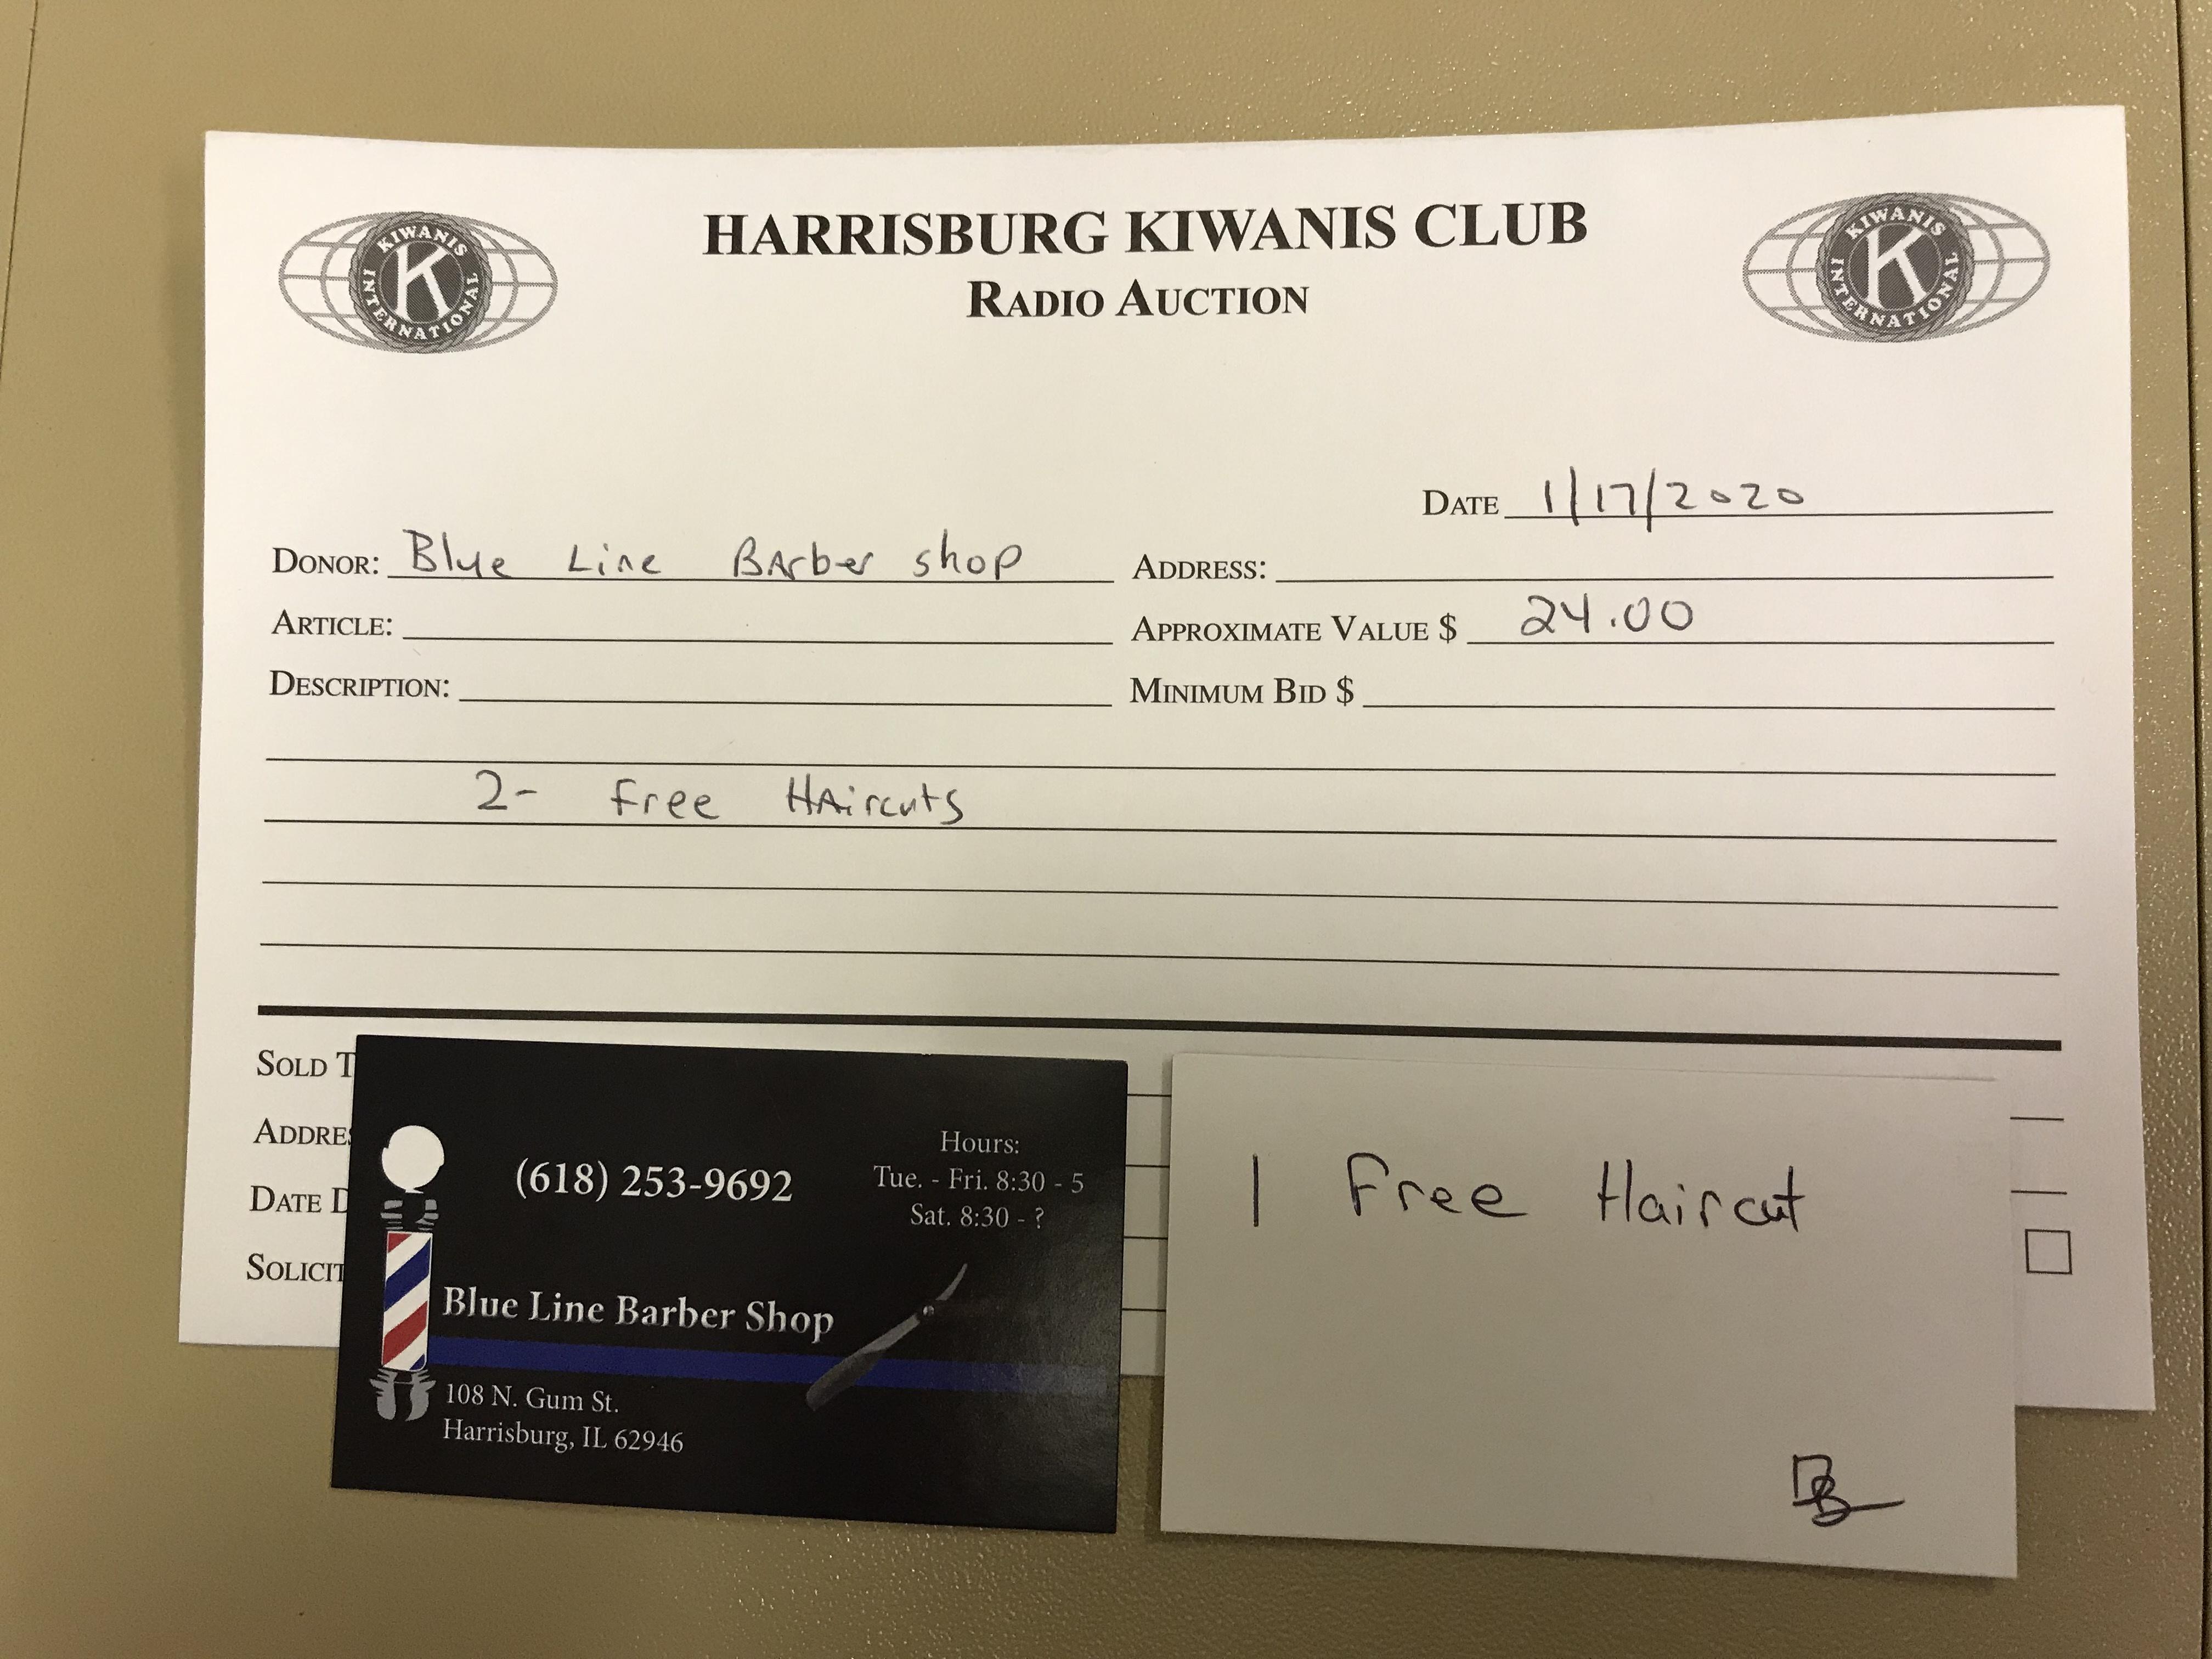 Item 401 - Blue Line Barber Shop 2 Free Haircuts